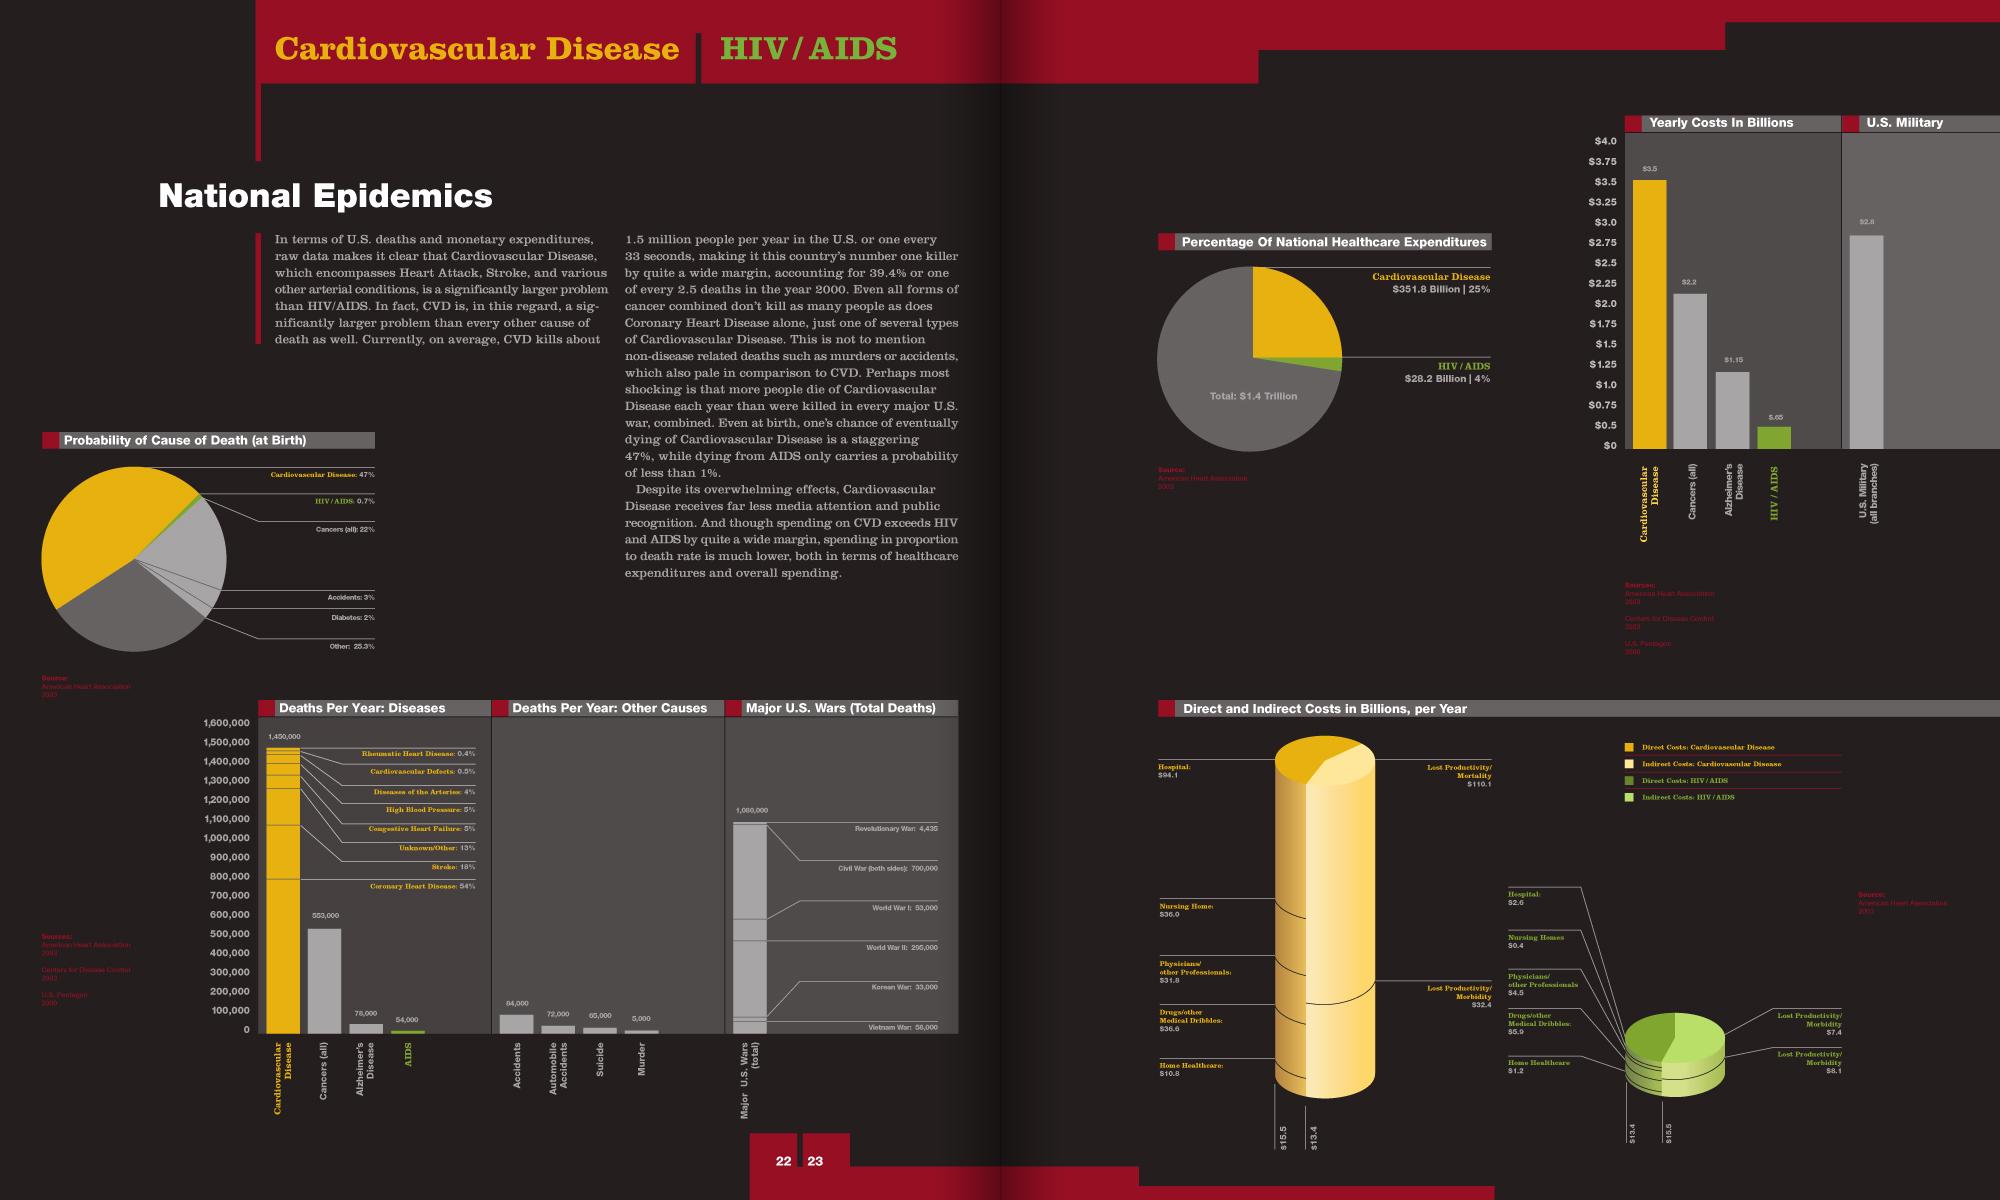 magazine article segment comparing monetary and mortality statistics of Cardiovascular Disease vs. HIV/AIDS